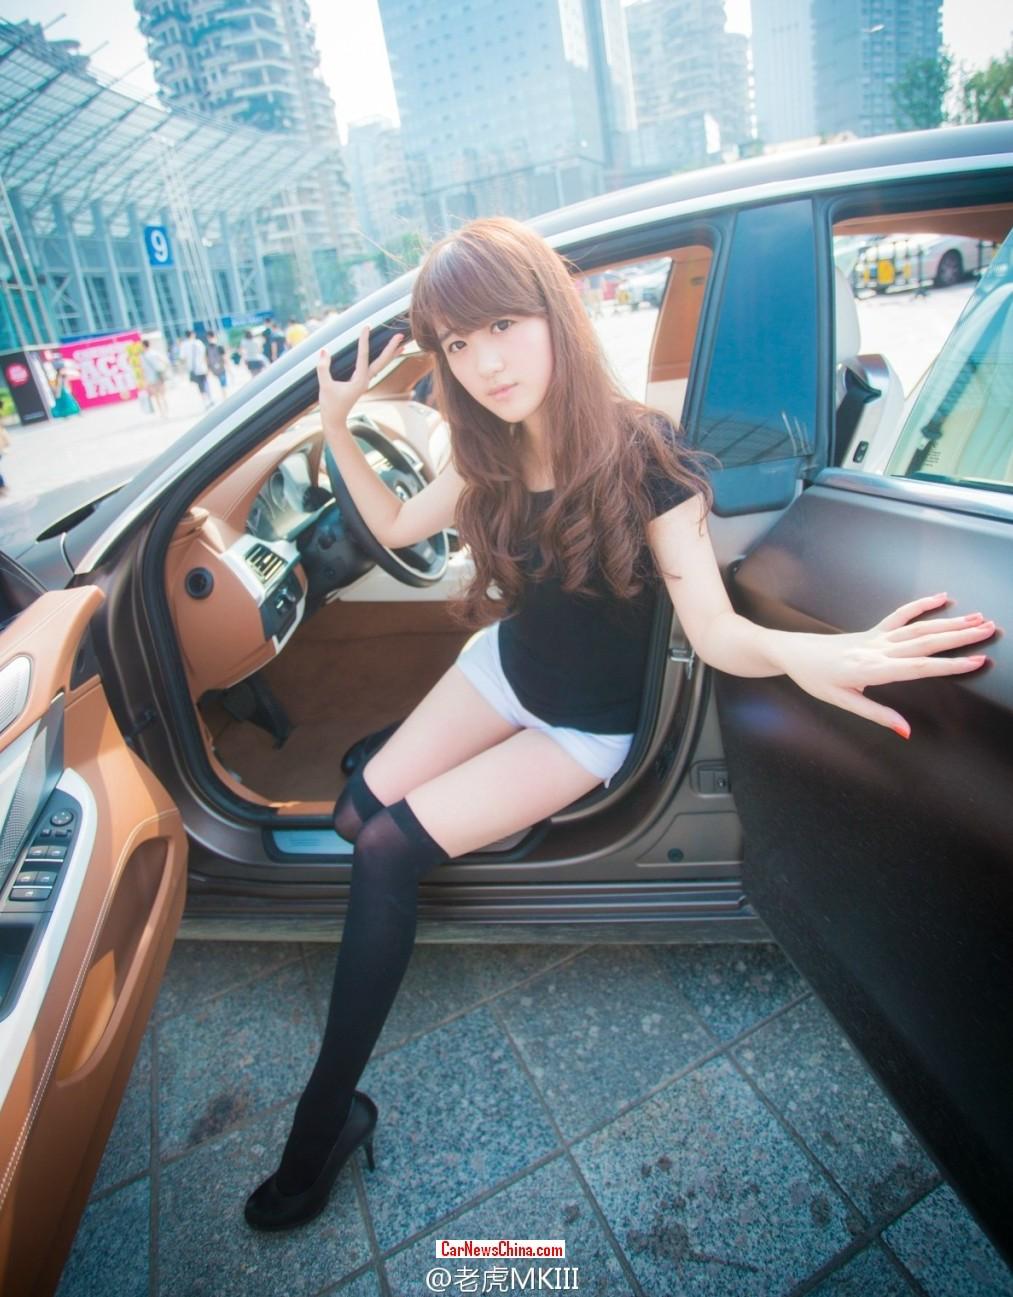 bmw-china-girl-2